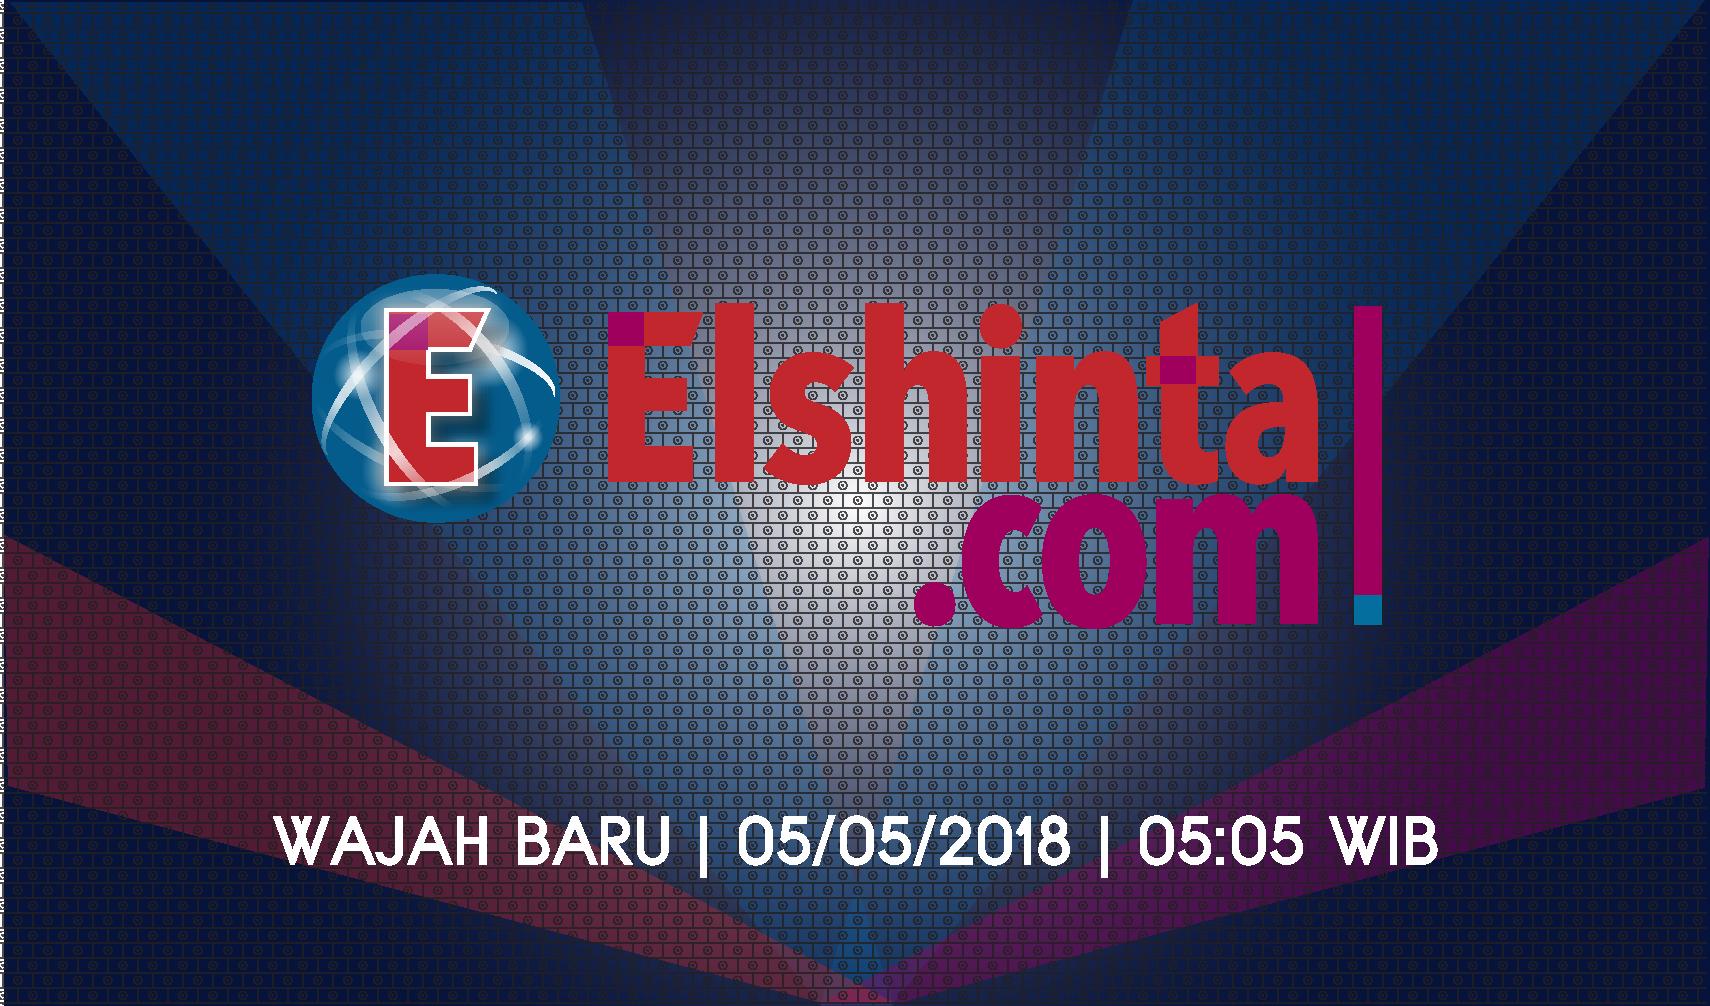 Elshinta Dotcom tampilan baru mengusung angka 5 (lima). Ada apa dengan angka lima?